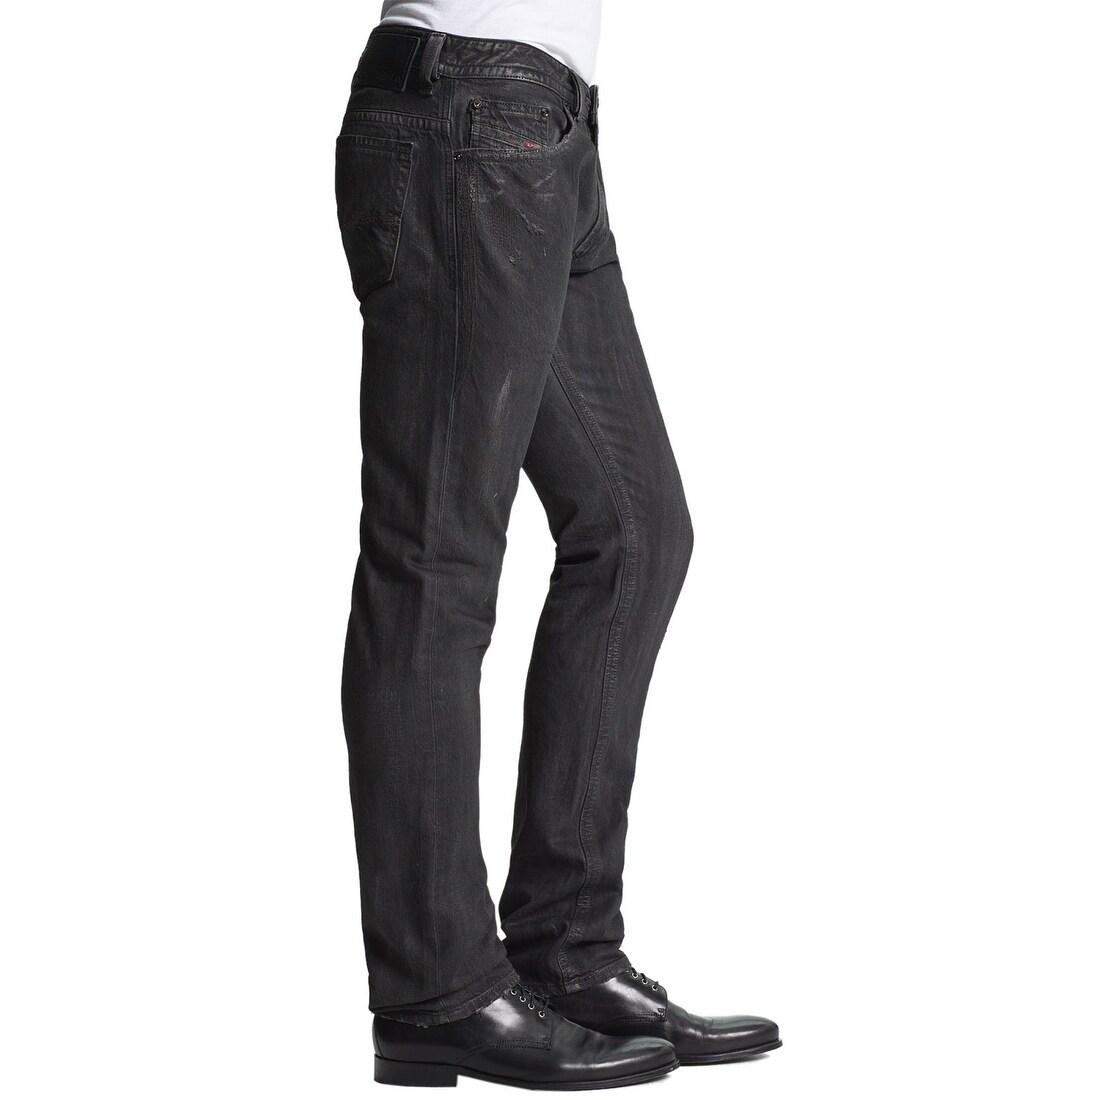 f2a5fabb Shop Diesel Mens Thavar Black Limited Edition Skinny Jeans 30x32 ...